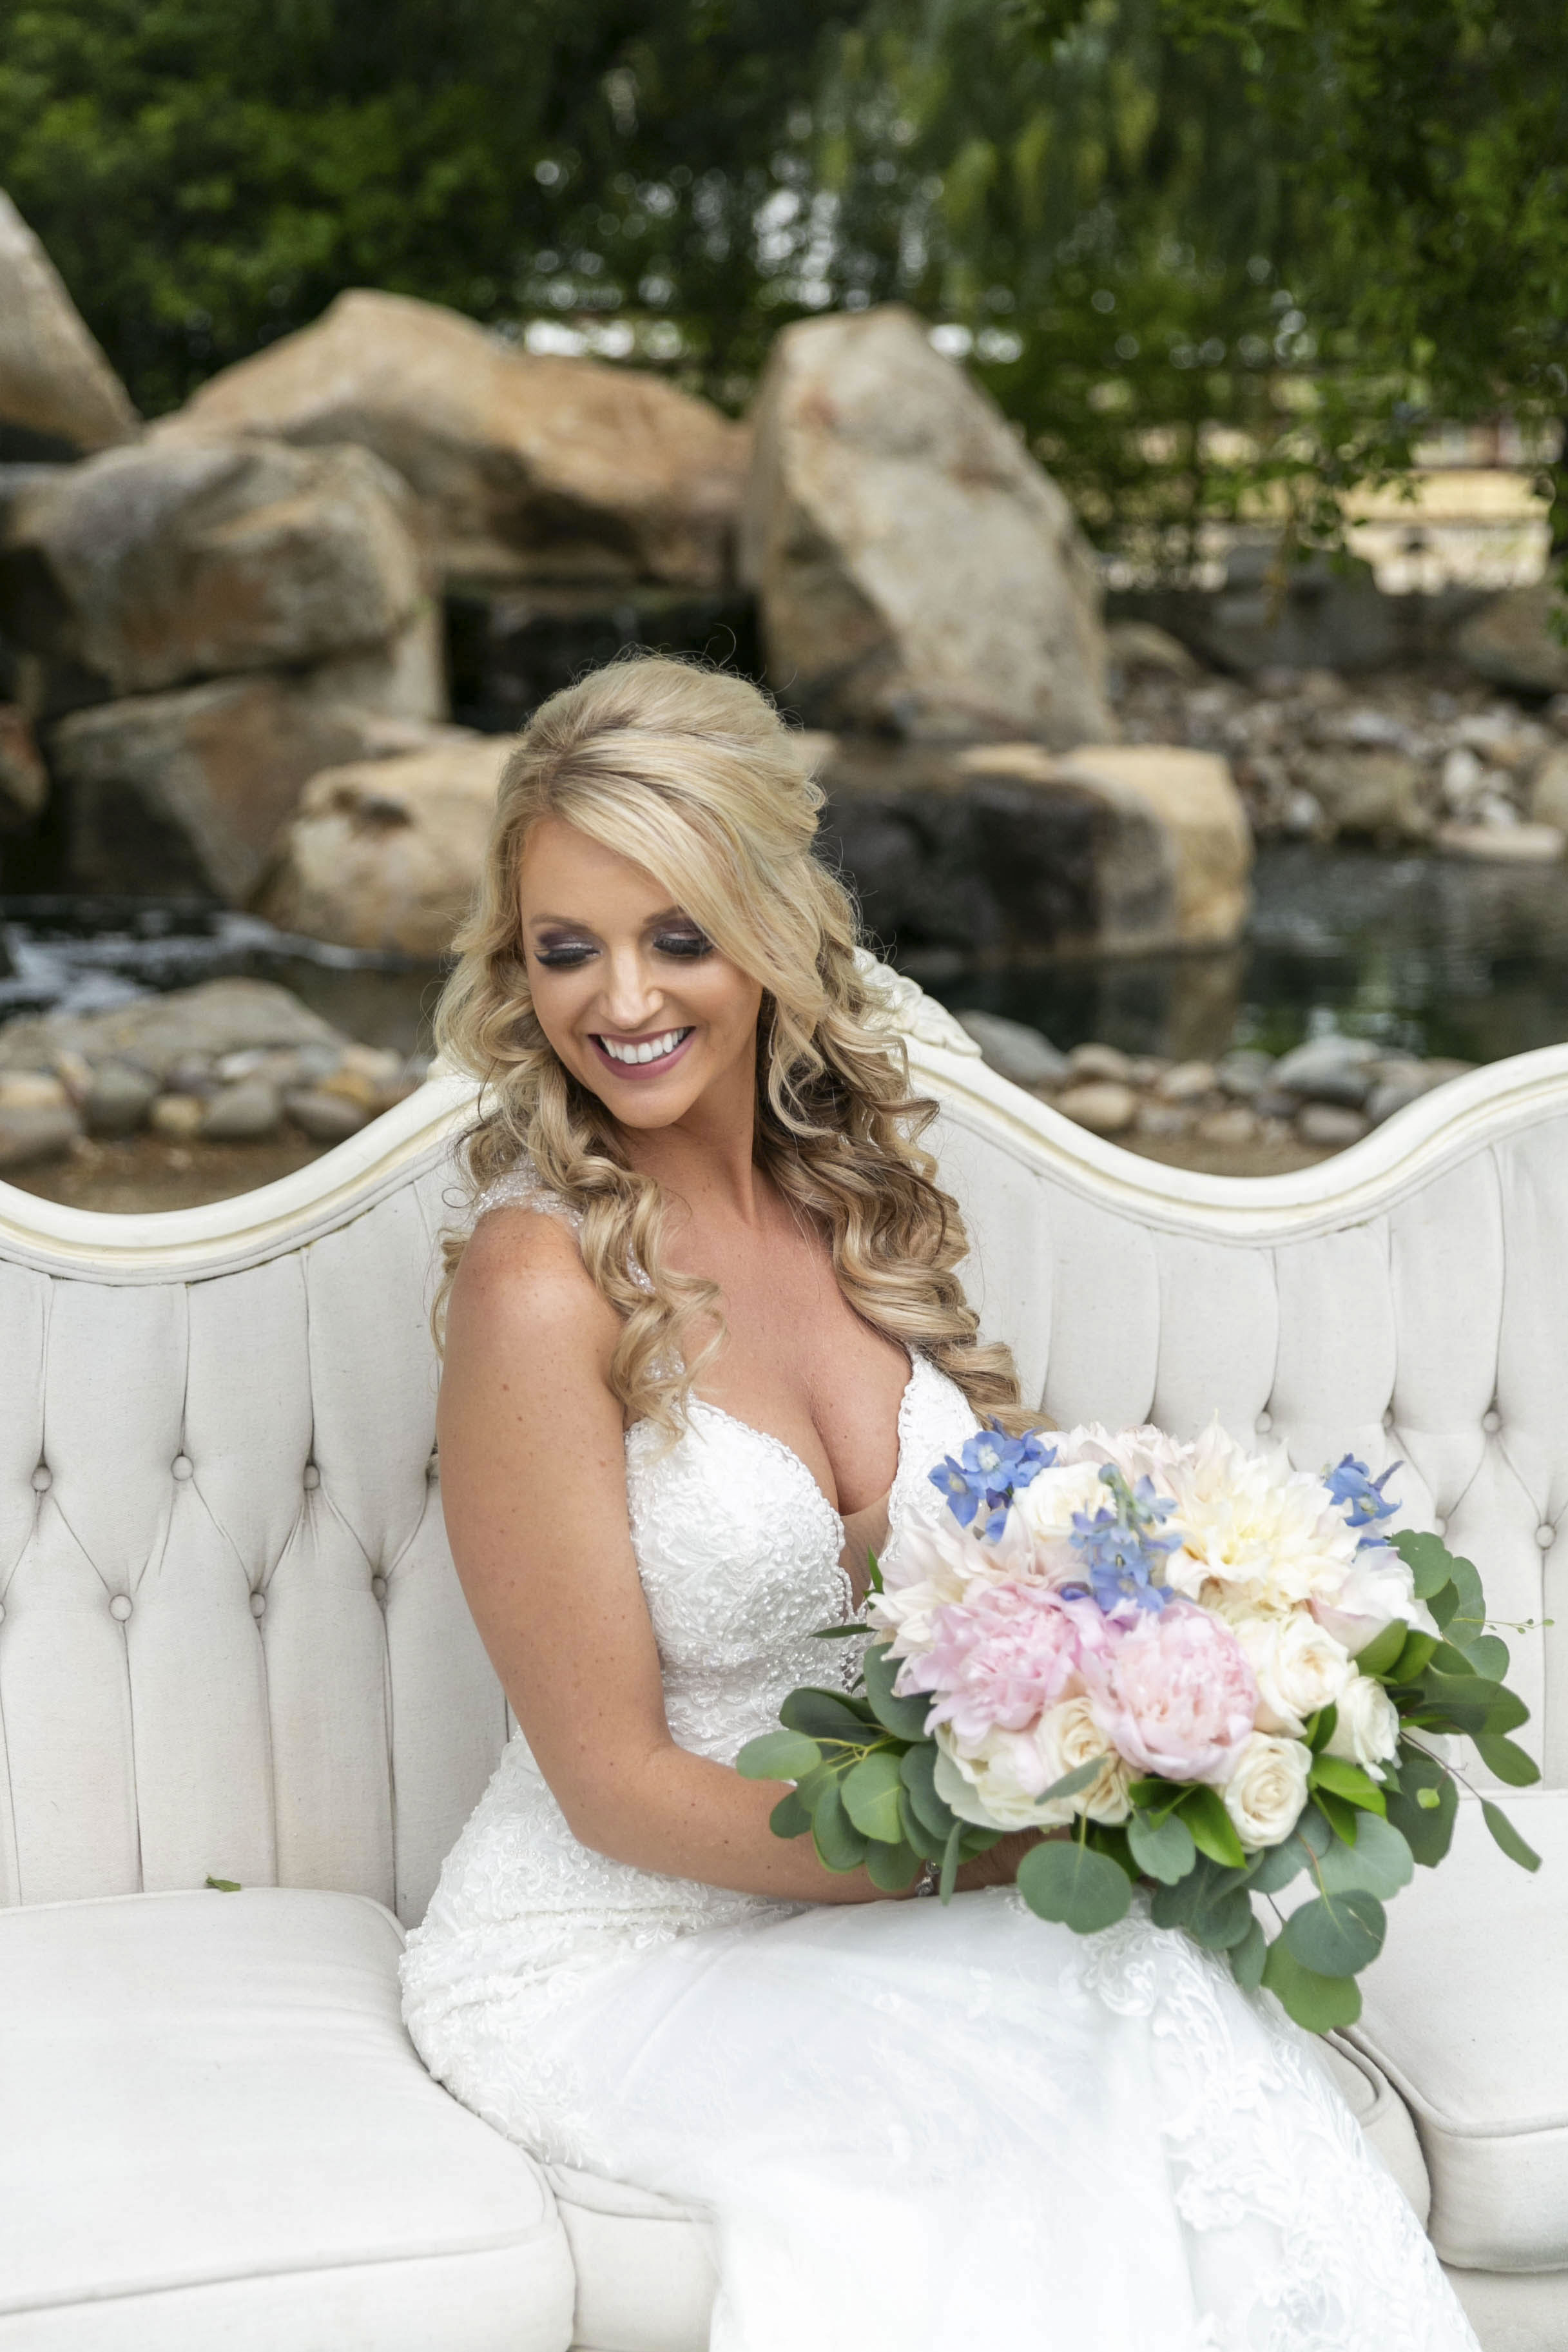 Domenica Beauty _ Hair and Makeup Artist _Wedding _ Temecula, CA Wedding _ Briana and Samuel _ 17.JPG